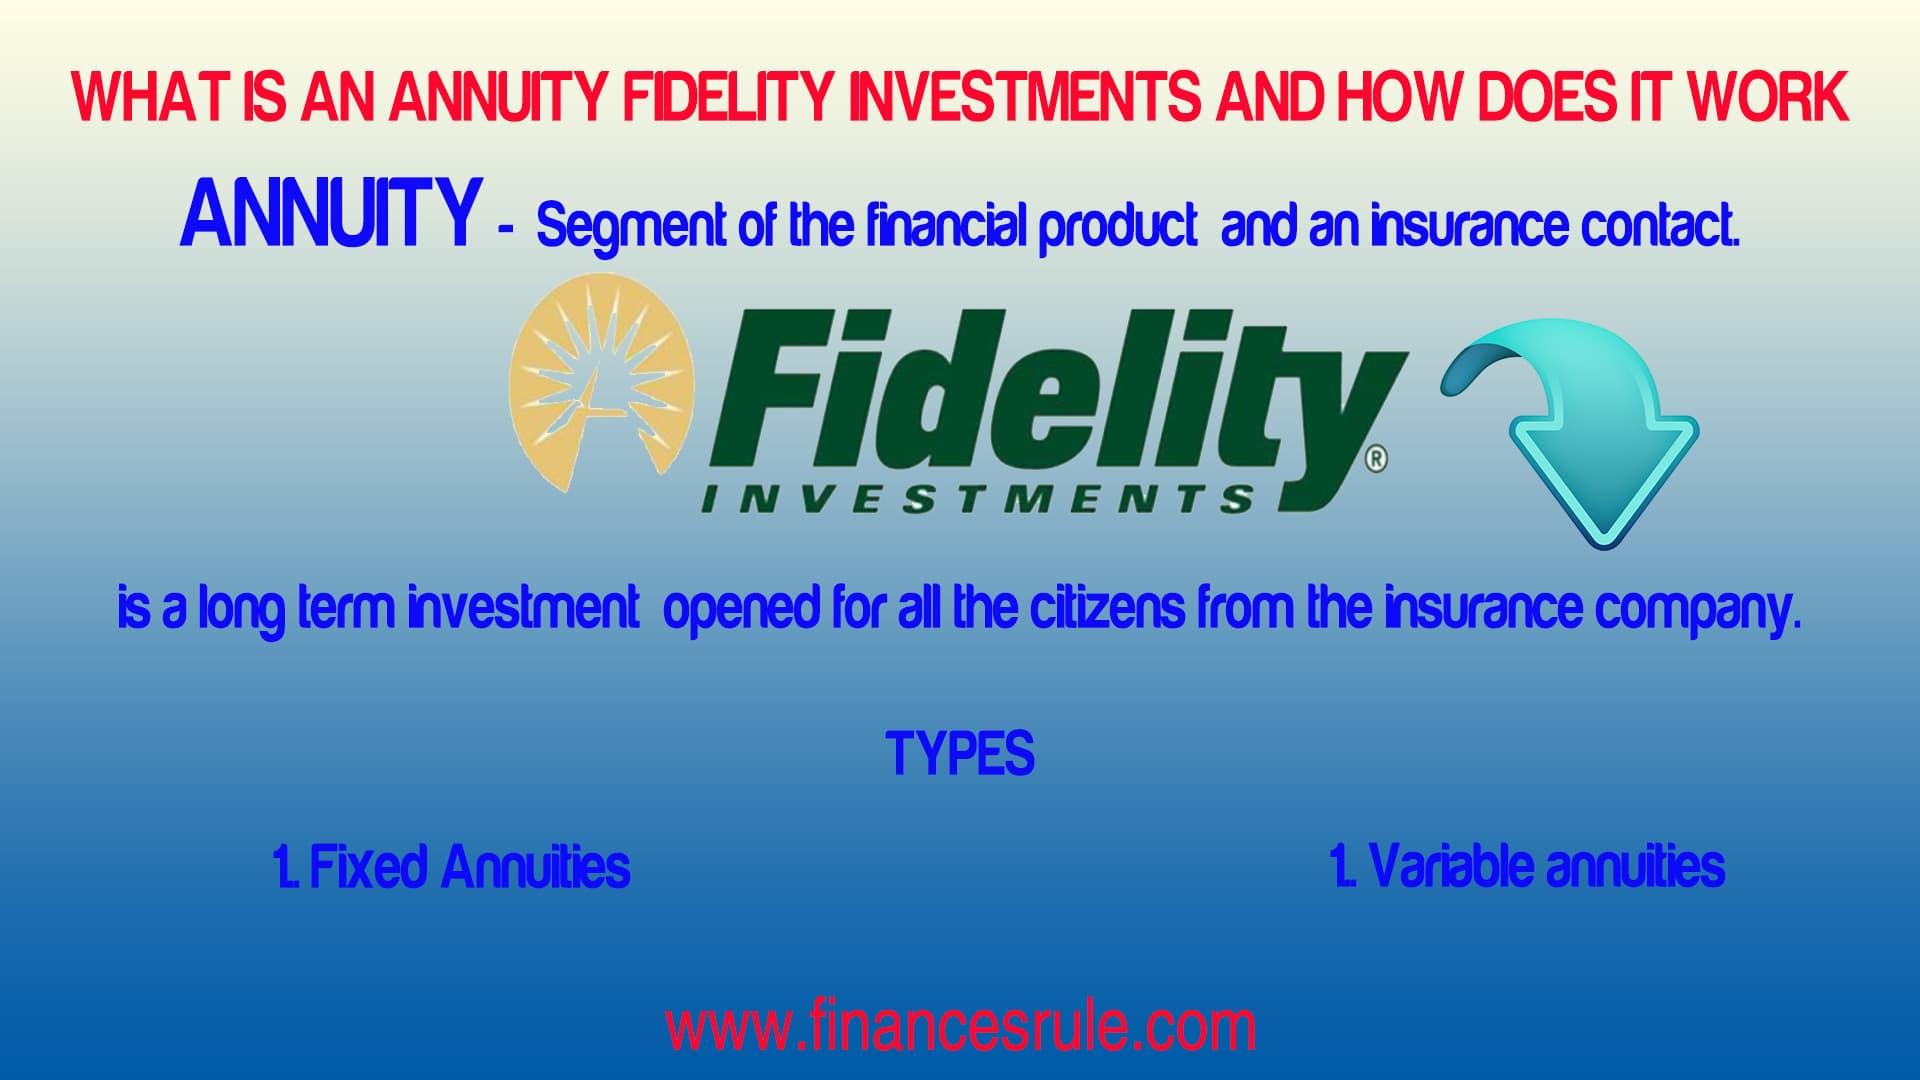 Fidelity Anuity